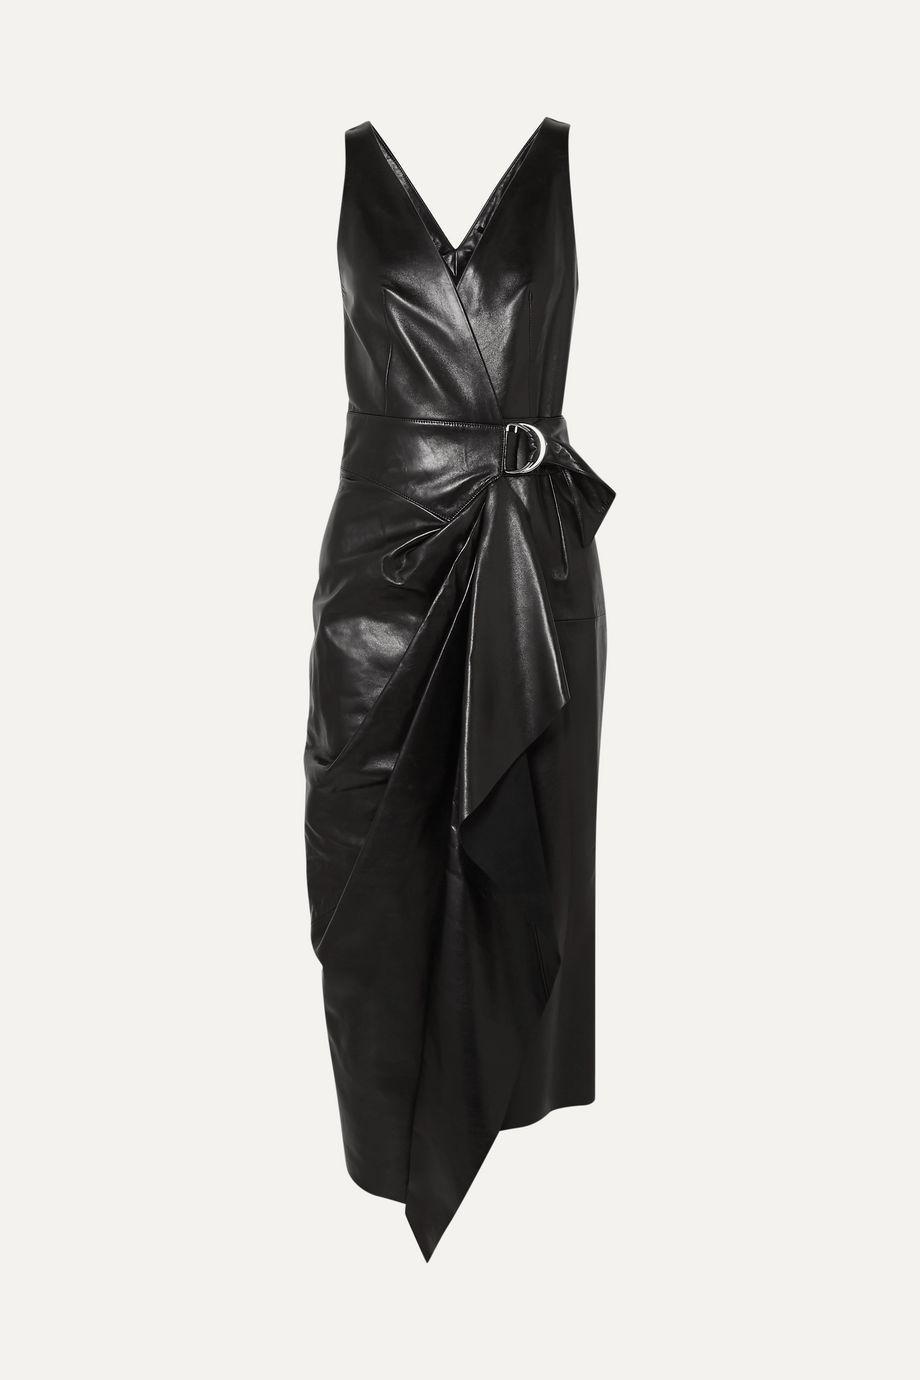 Isabel Marant Fanelia asymmetrisches Midi-Wickelkleid aus Leder